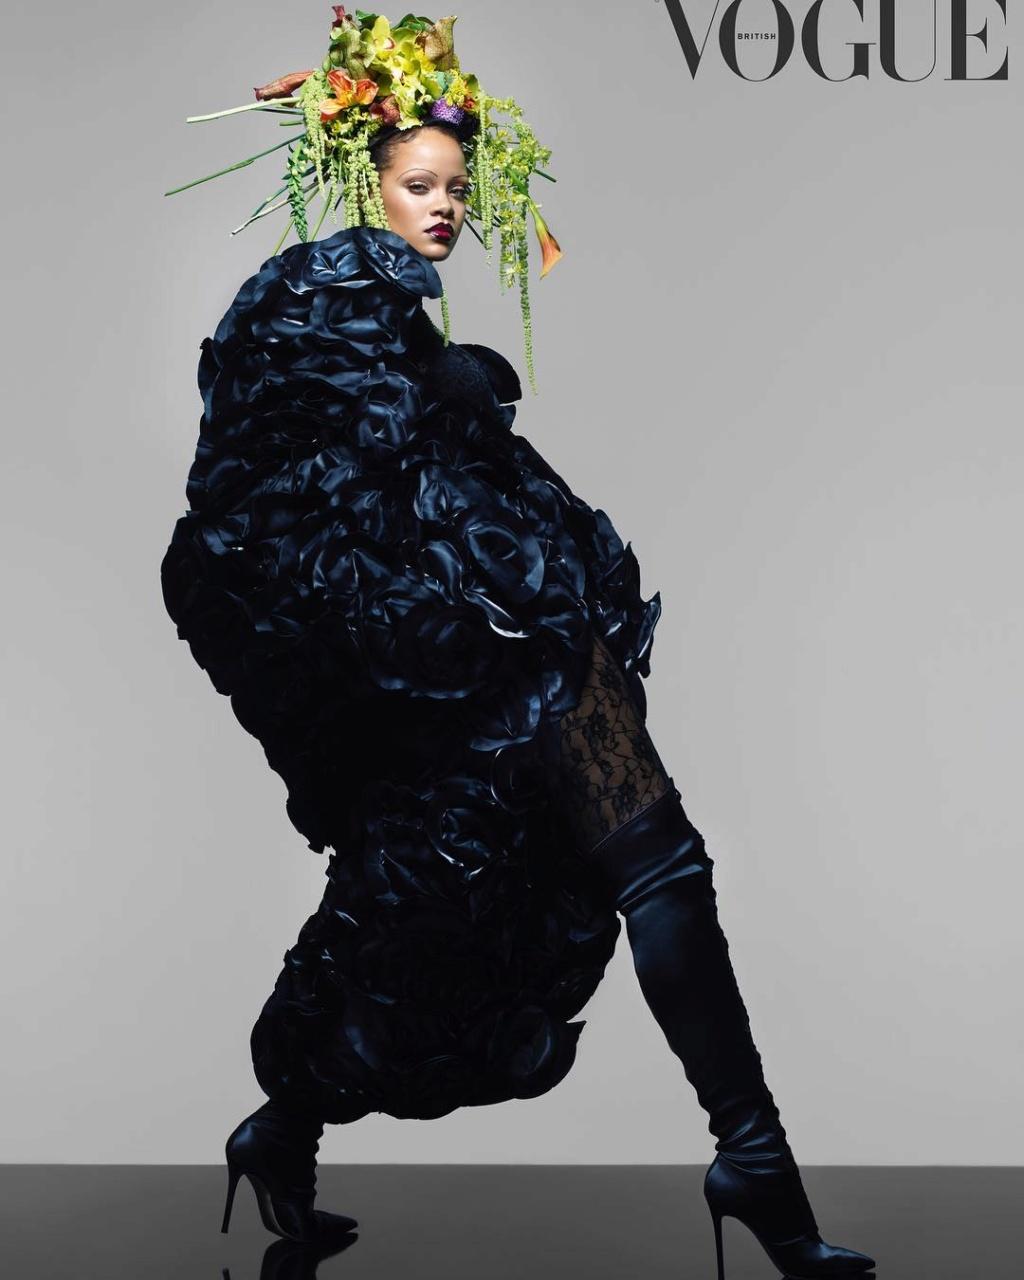 Rihanna >> preparando nuevo álbum - Página 11 Img_2048